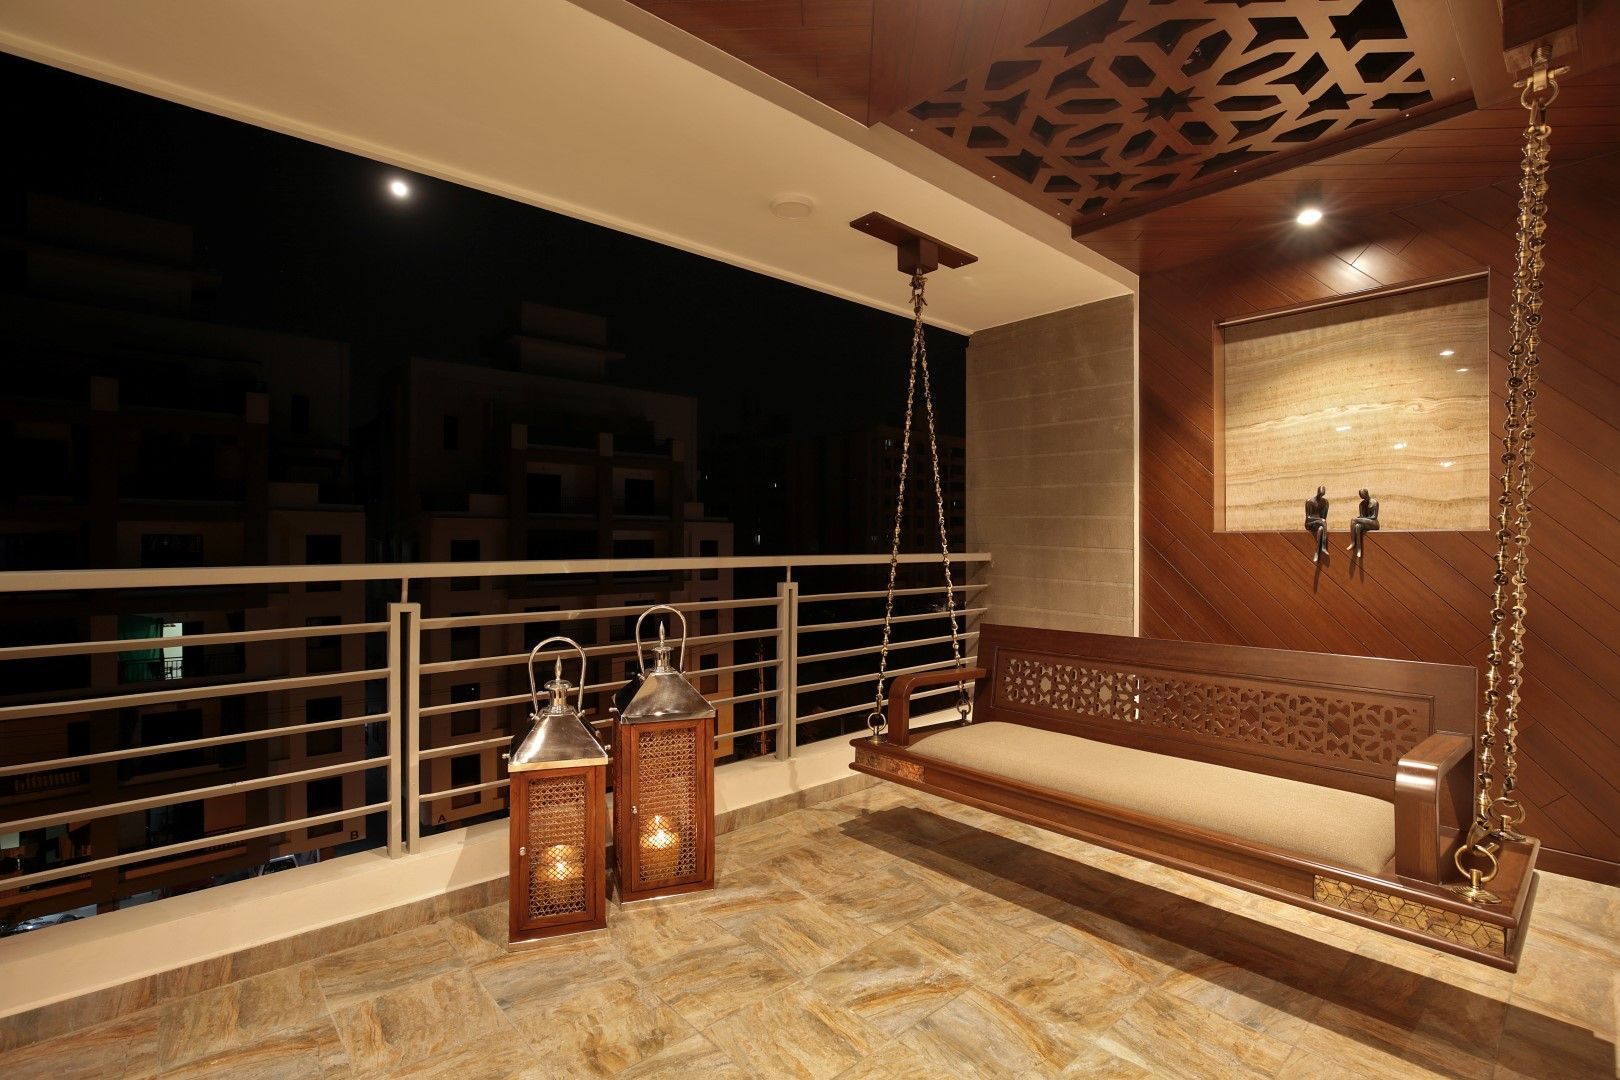 3 Bhk Flat Interiors The Oak Woods Vadodara Studio7 The Architects Diary In 2020 Flat Interior Flat Interior Design Apartment Interior